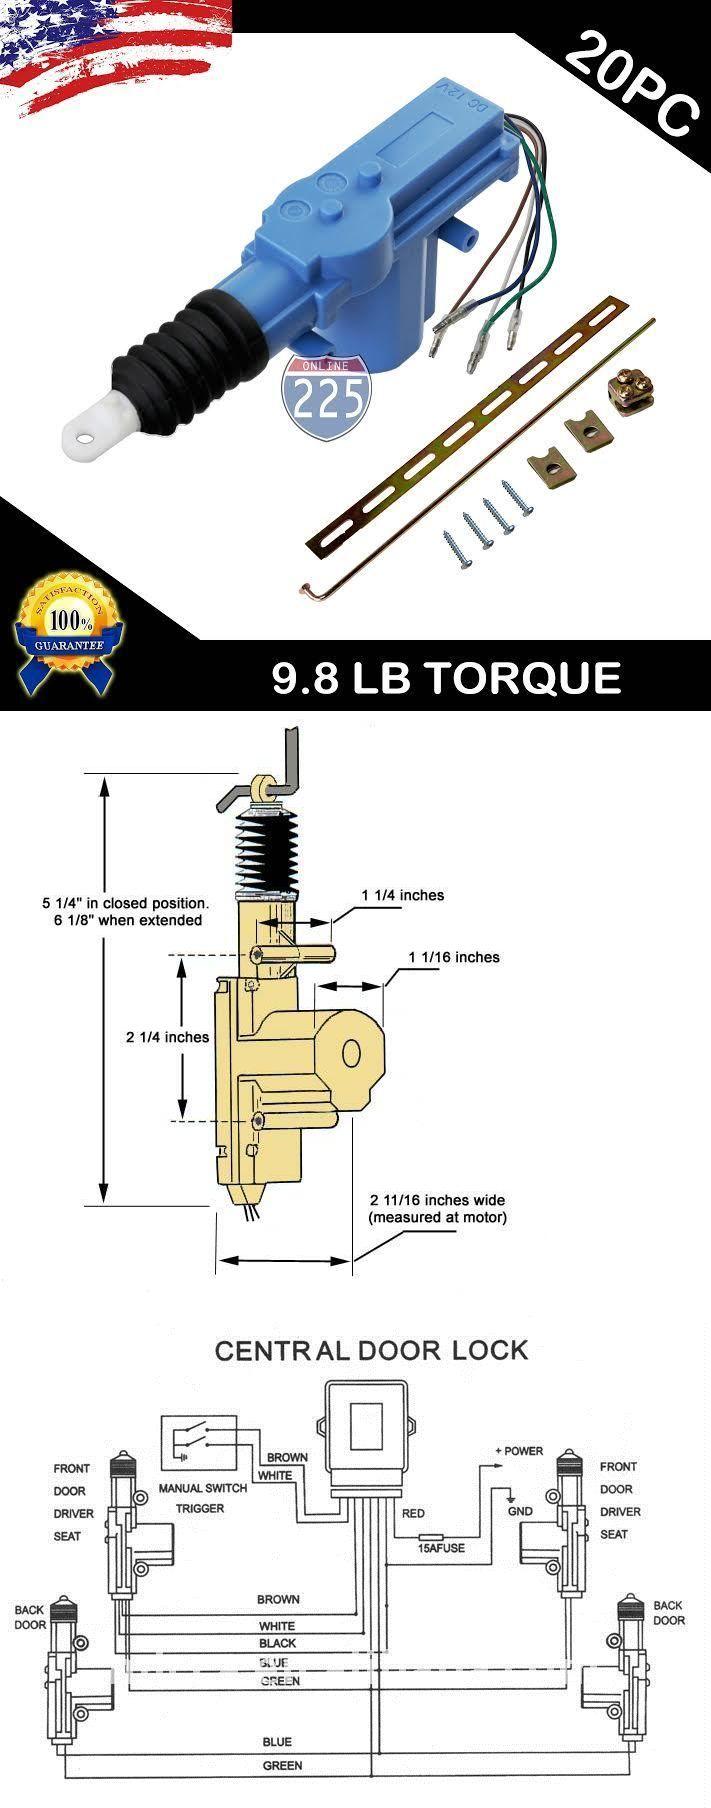 0e8a17366da6fb765beb8969a1e92292 451m relay wiring diagram 5 wire 2000 focus fuse and relay panel dei 451m wiring diagram at webbmarketing.co